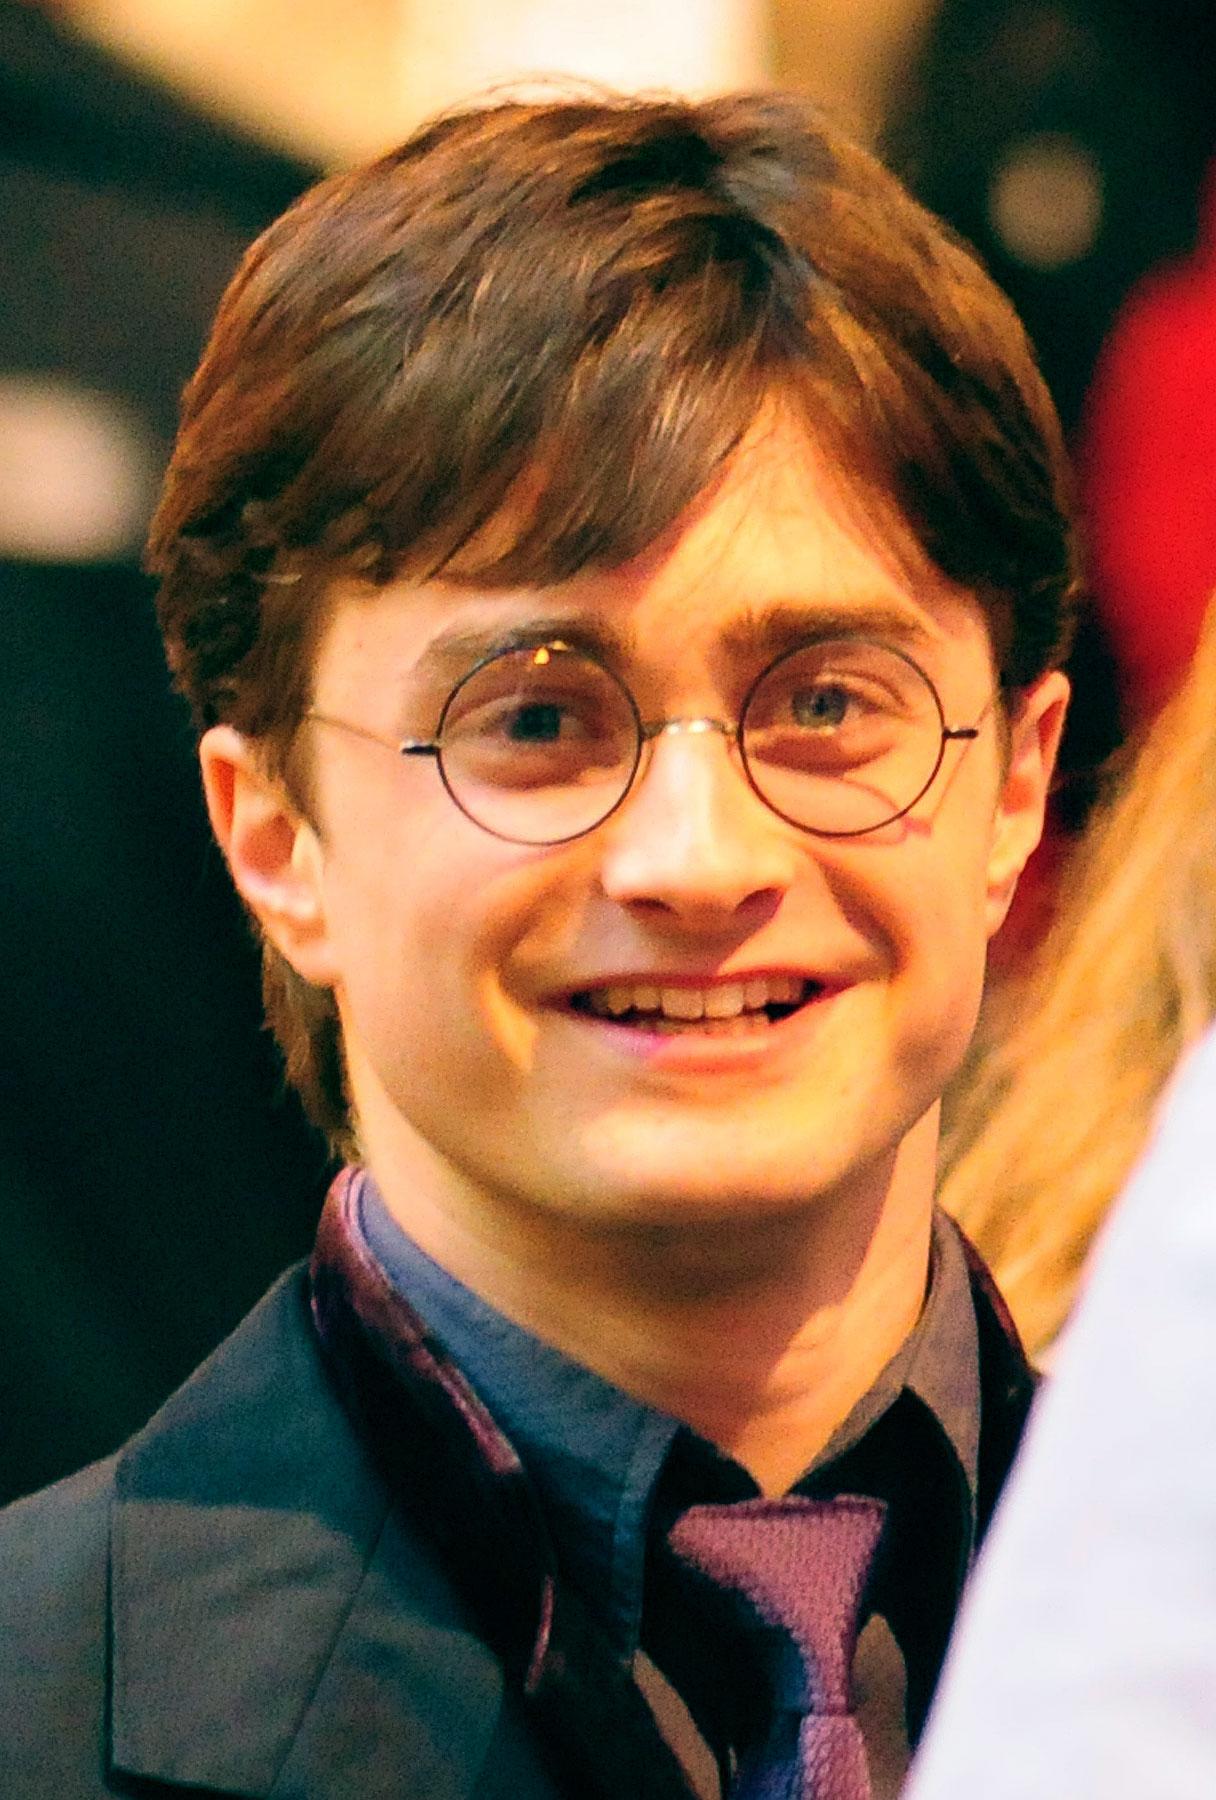 Daniel Radcliffe Talks 'Harry Potter'